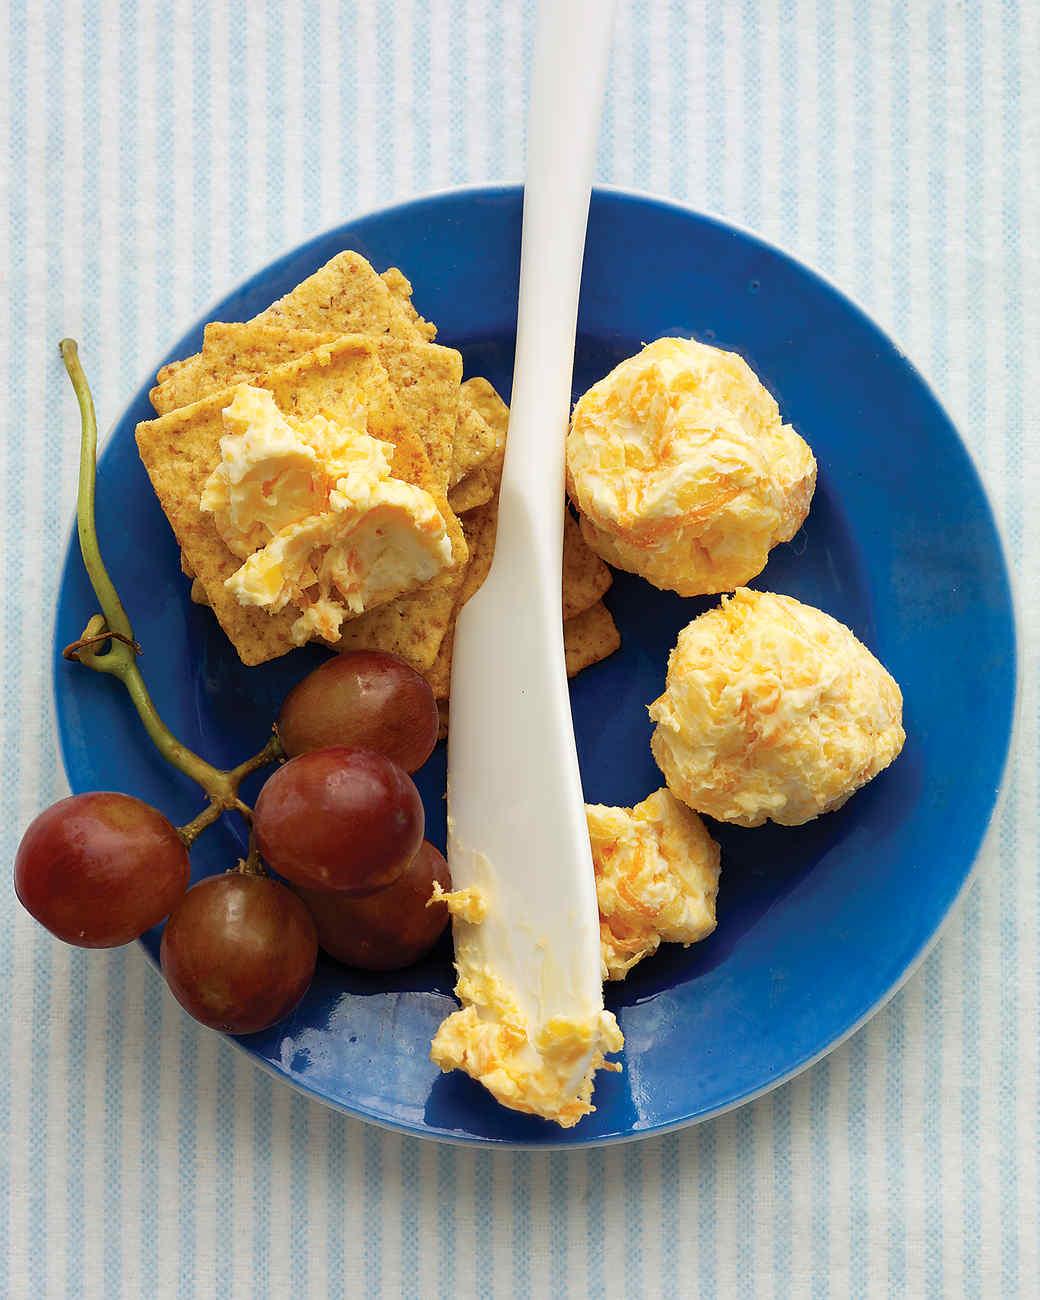 Cheddar-Carrot Balls